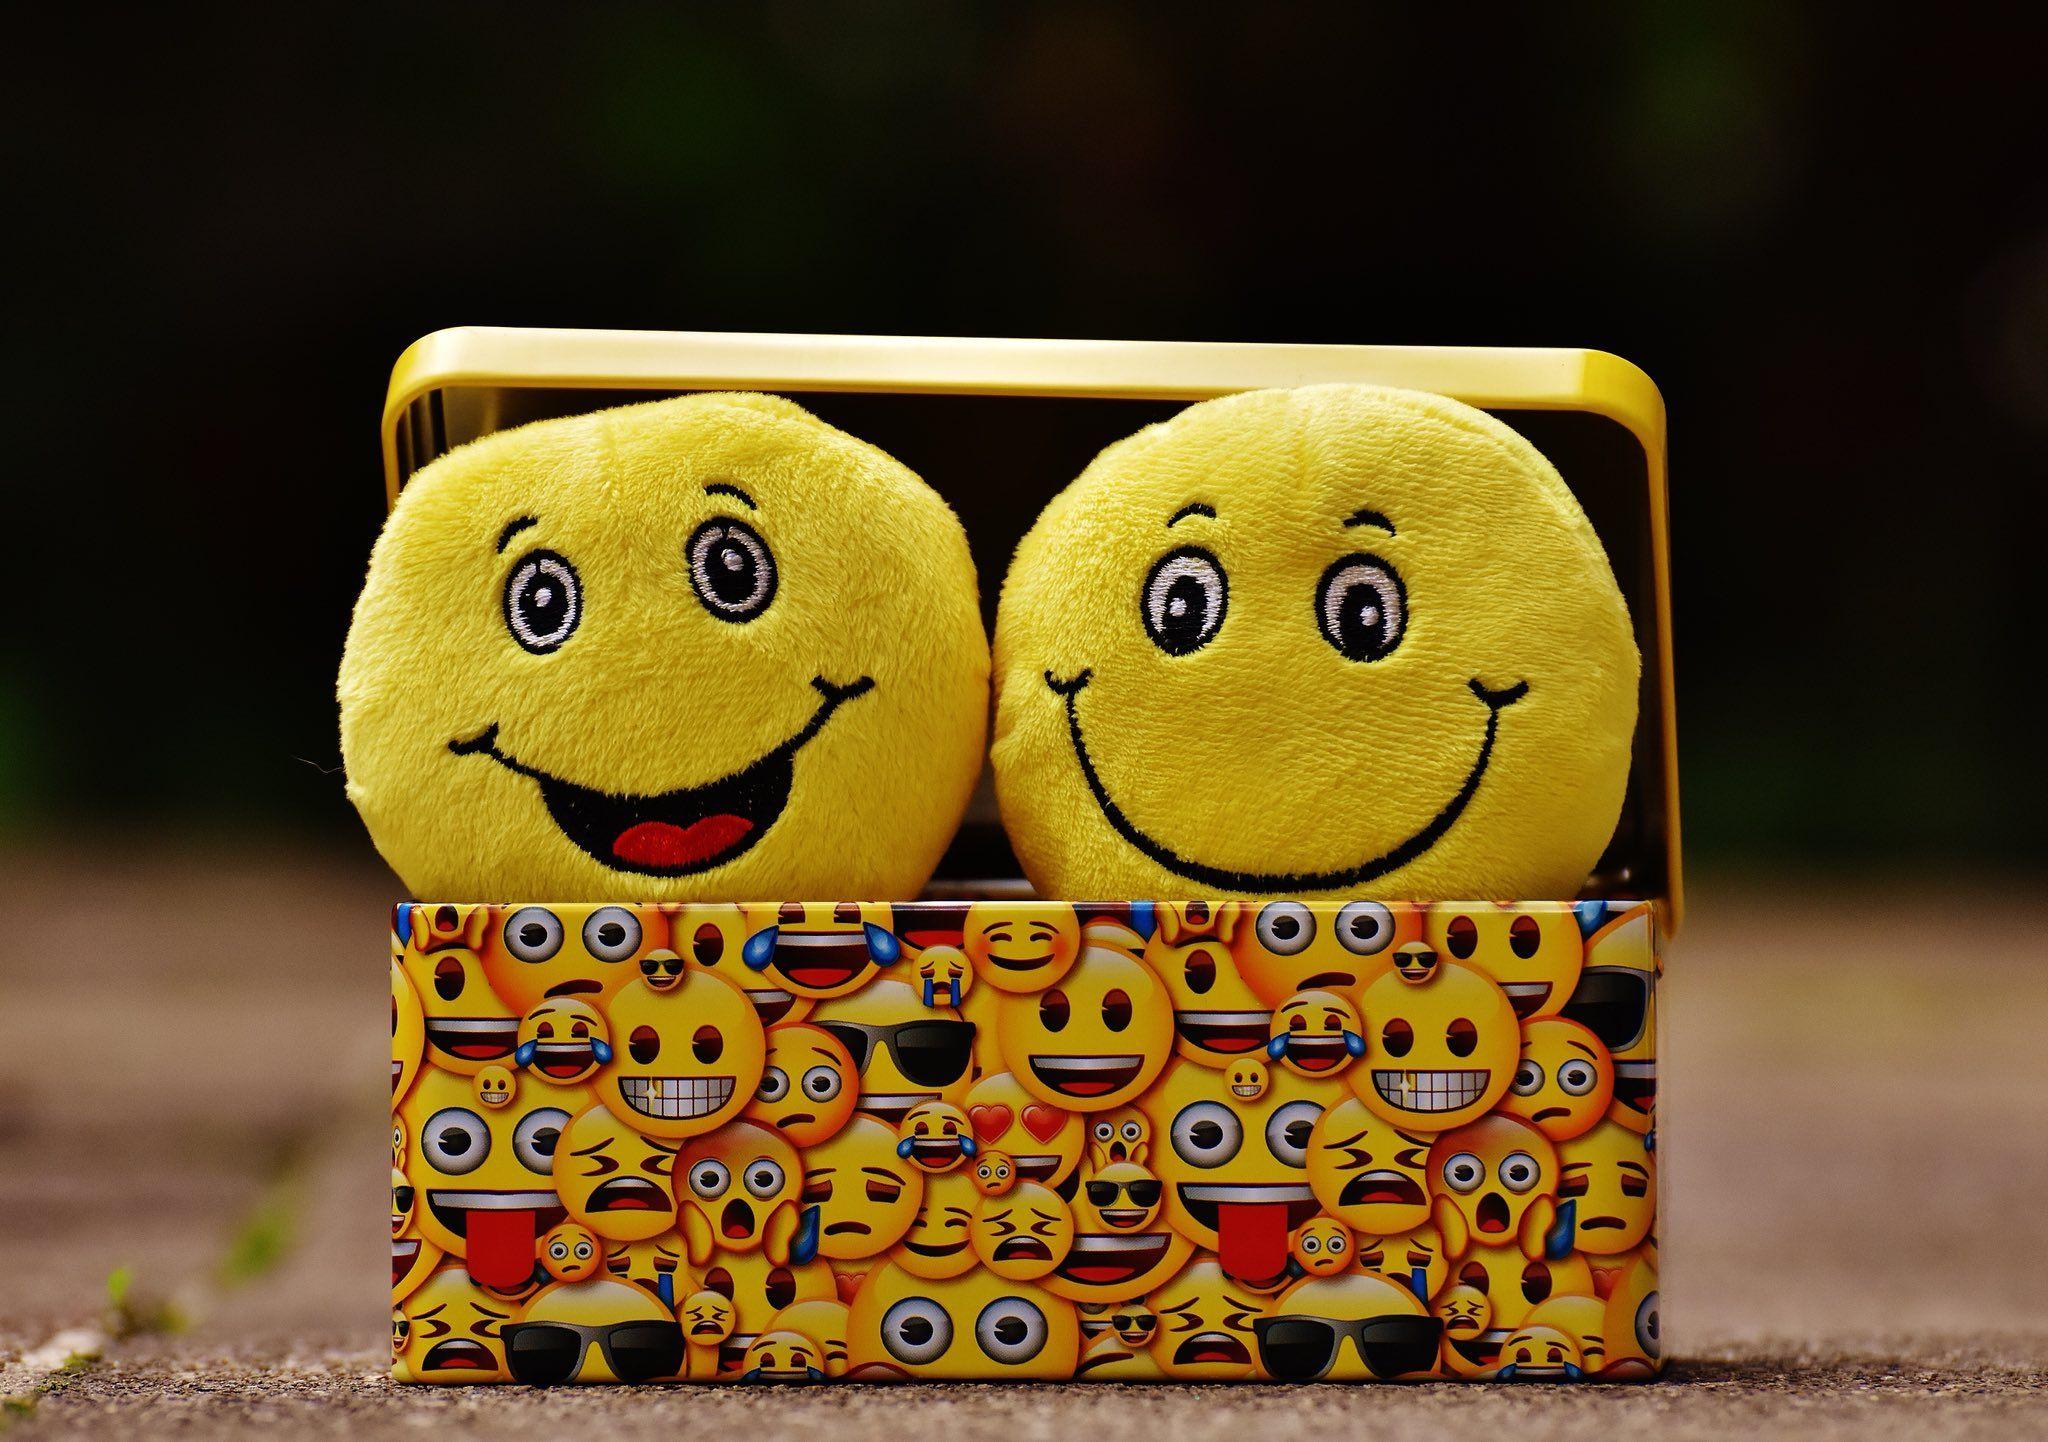 Mvng Cmpny Studio Ca On Twitter Whatsapp Dp Images Ways To Be Happier Whatsapp Dp